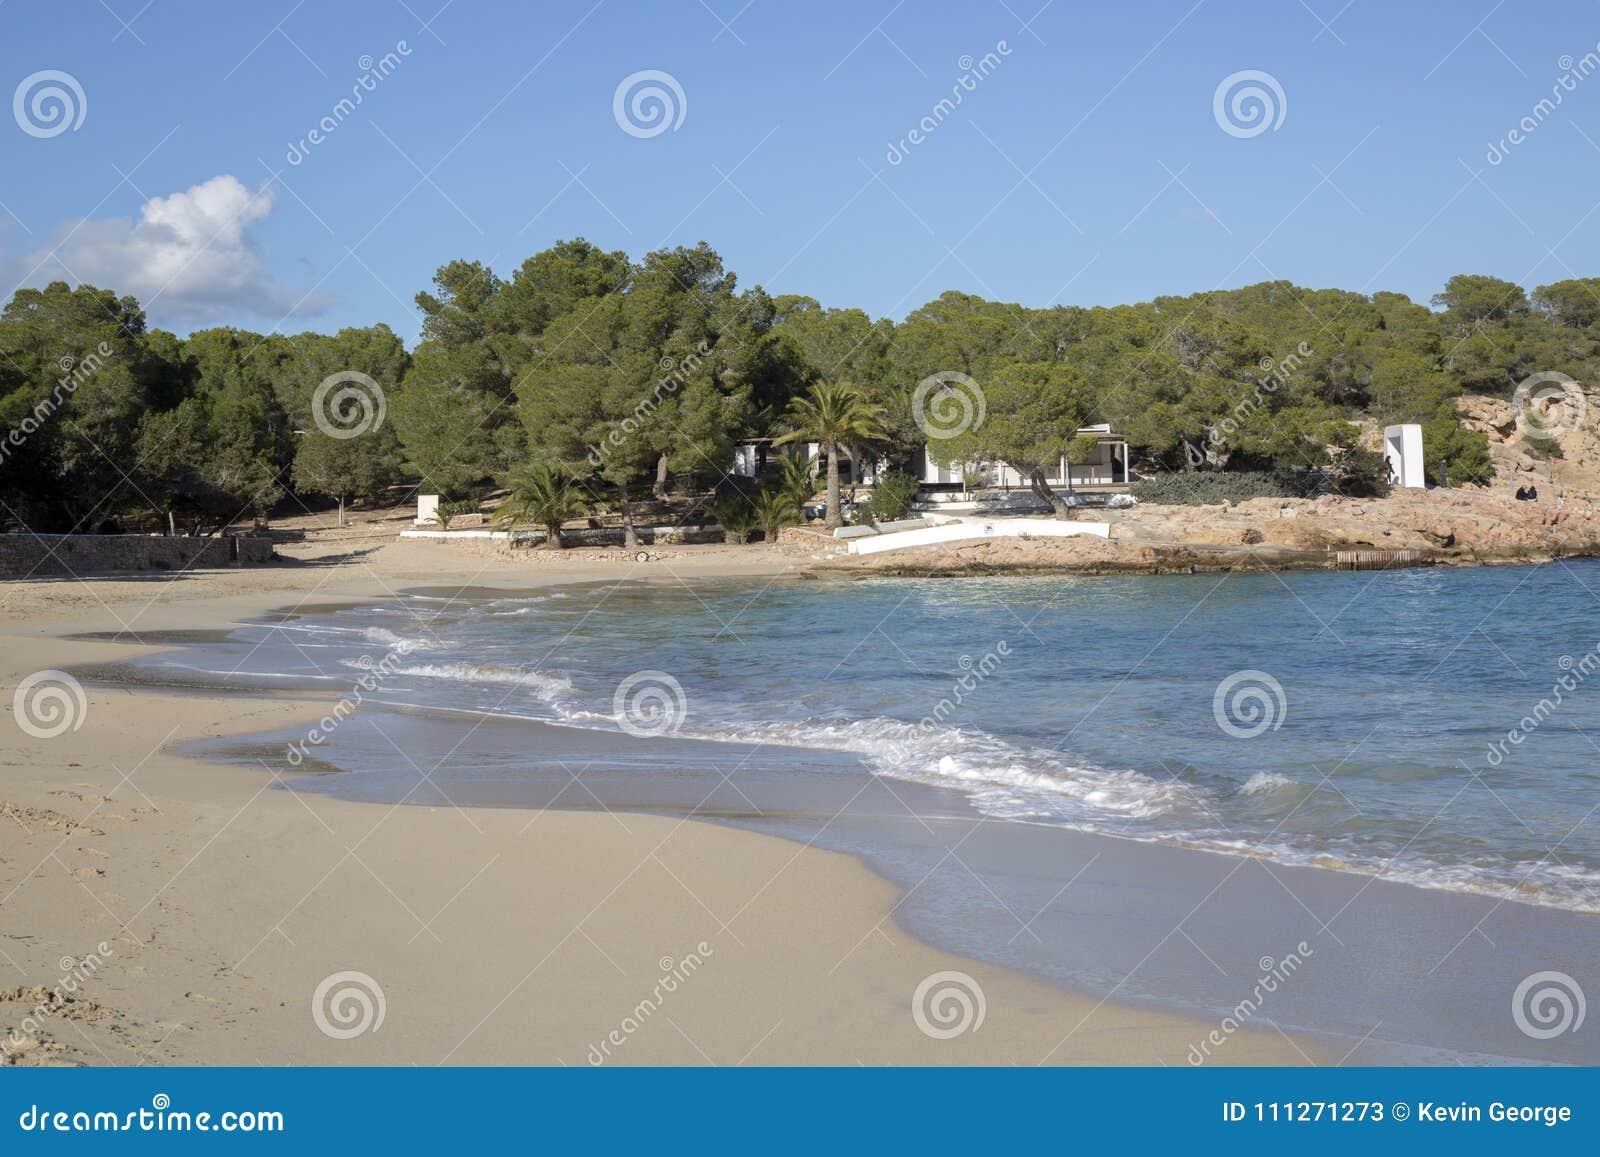 Pine Trees At Cala Bassa Cove Beach